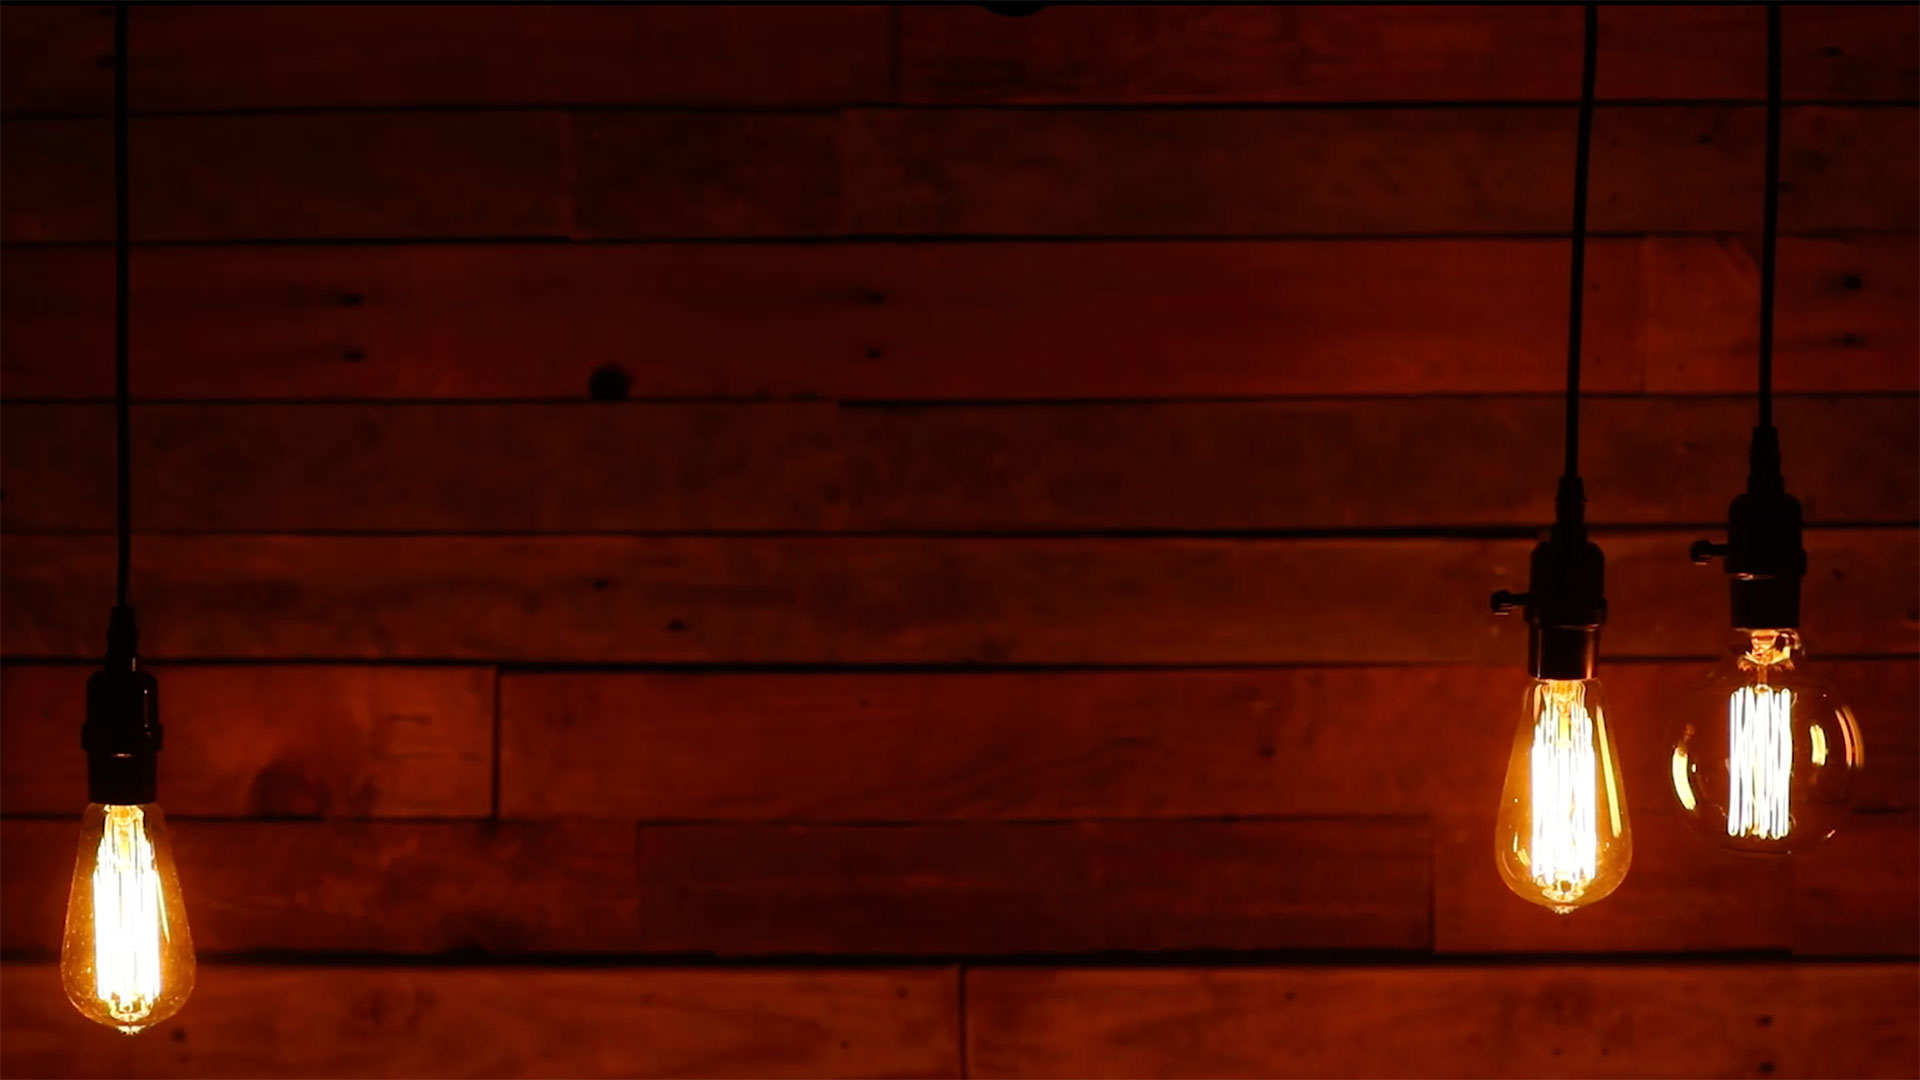 Three Urban Retro Low Hanging Light Bulbs on Wood Background Loop ...